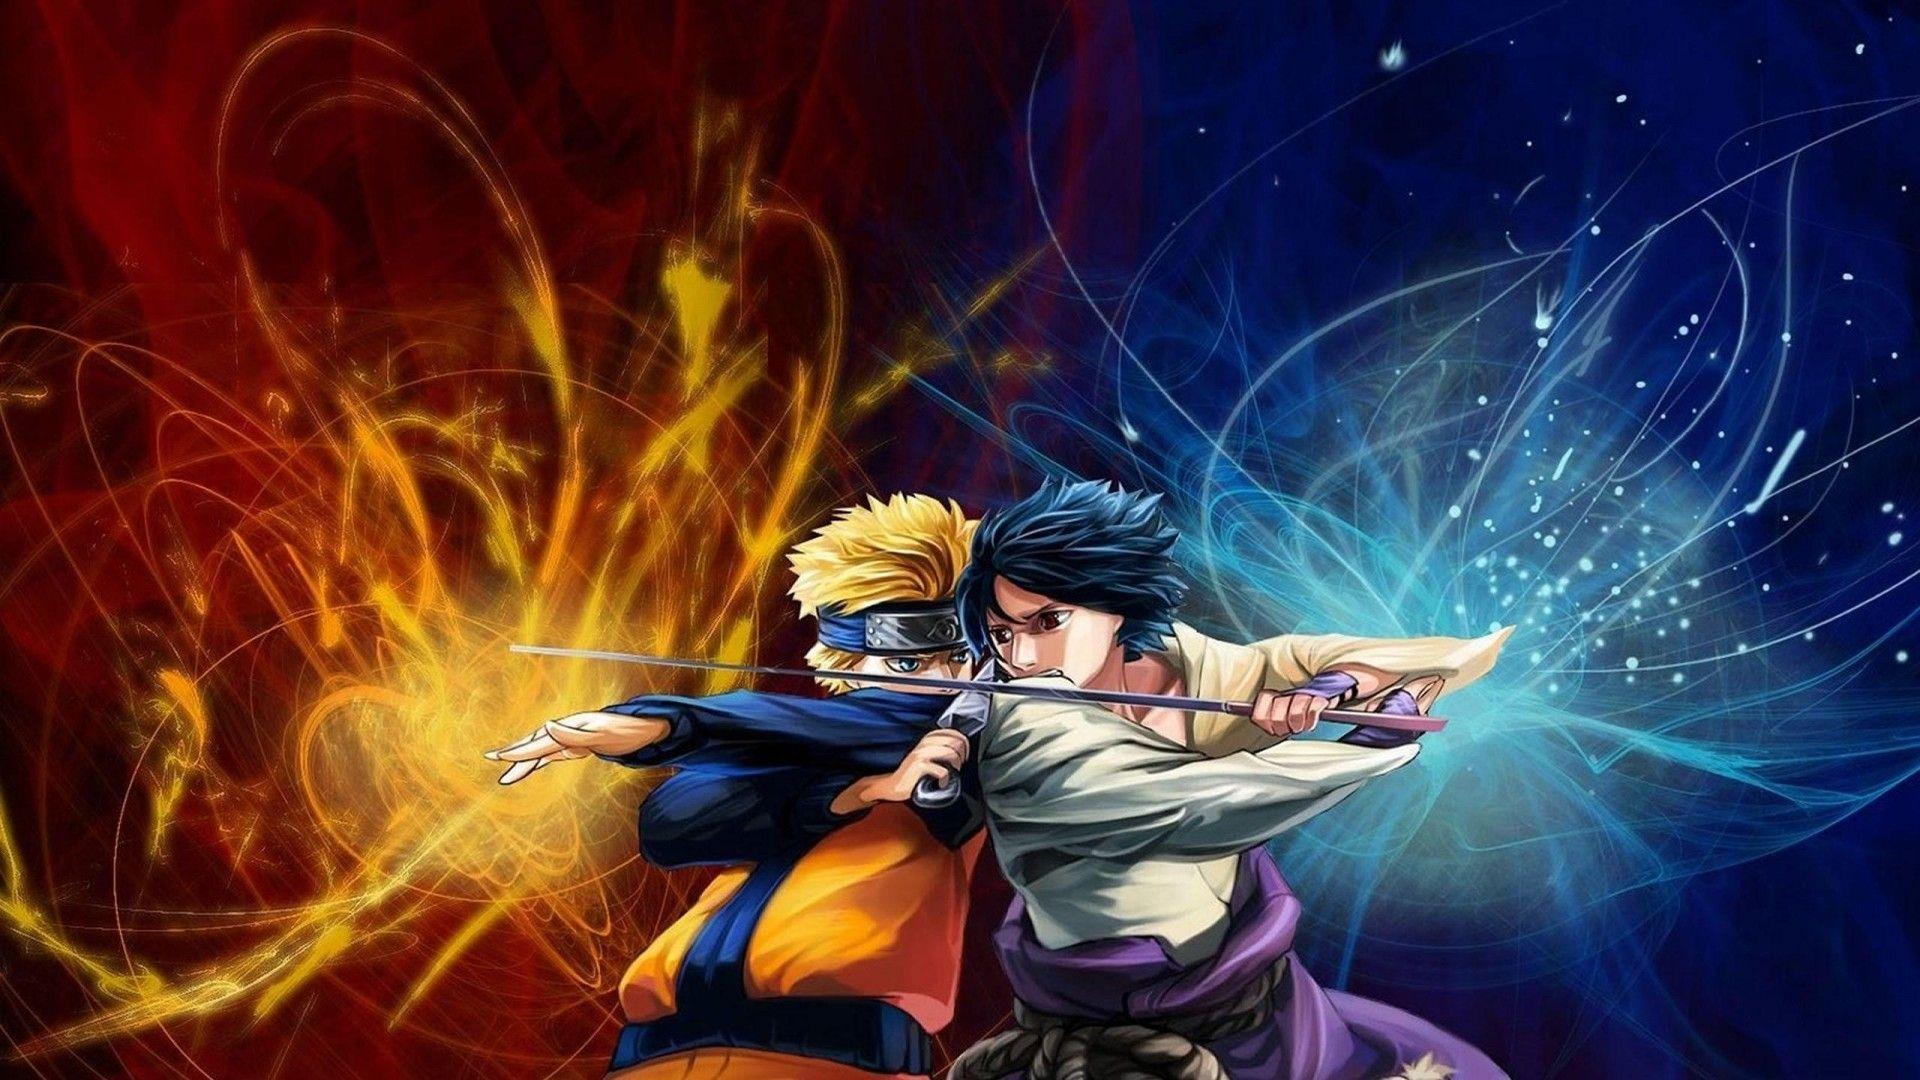 Wonderful Wallpaper Naruto Halloween - naruto-full-hd-wallpaper-16  Perfect Image Reference_67958.jpg